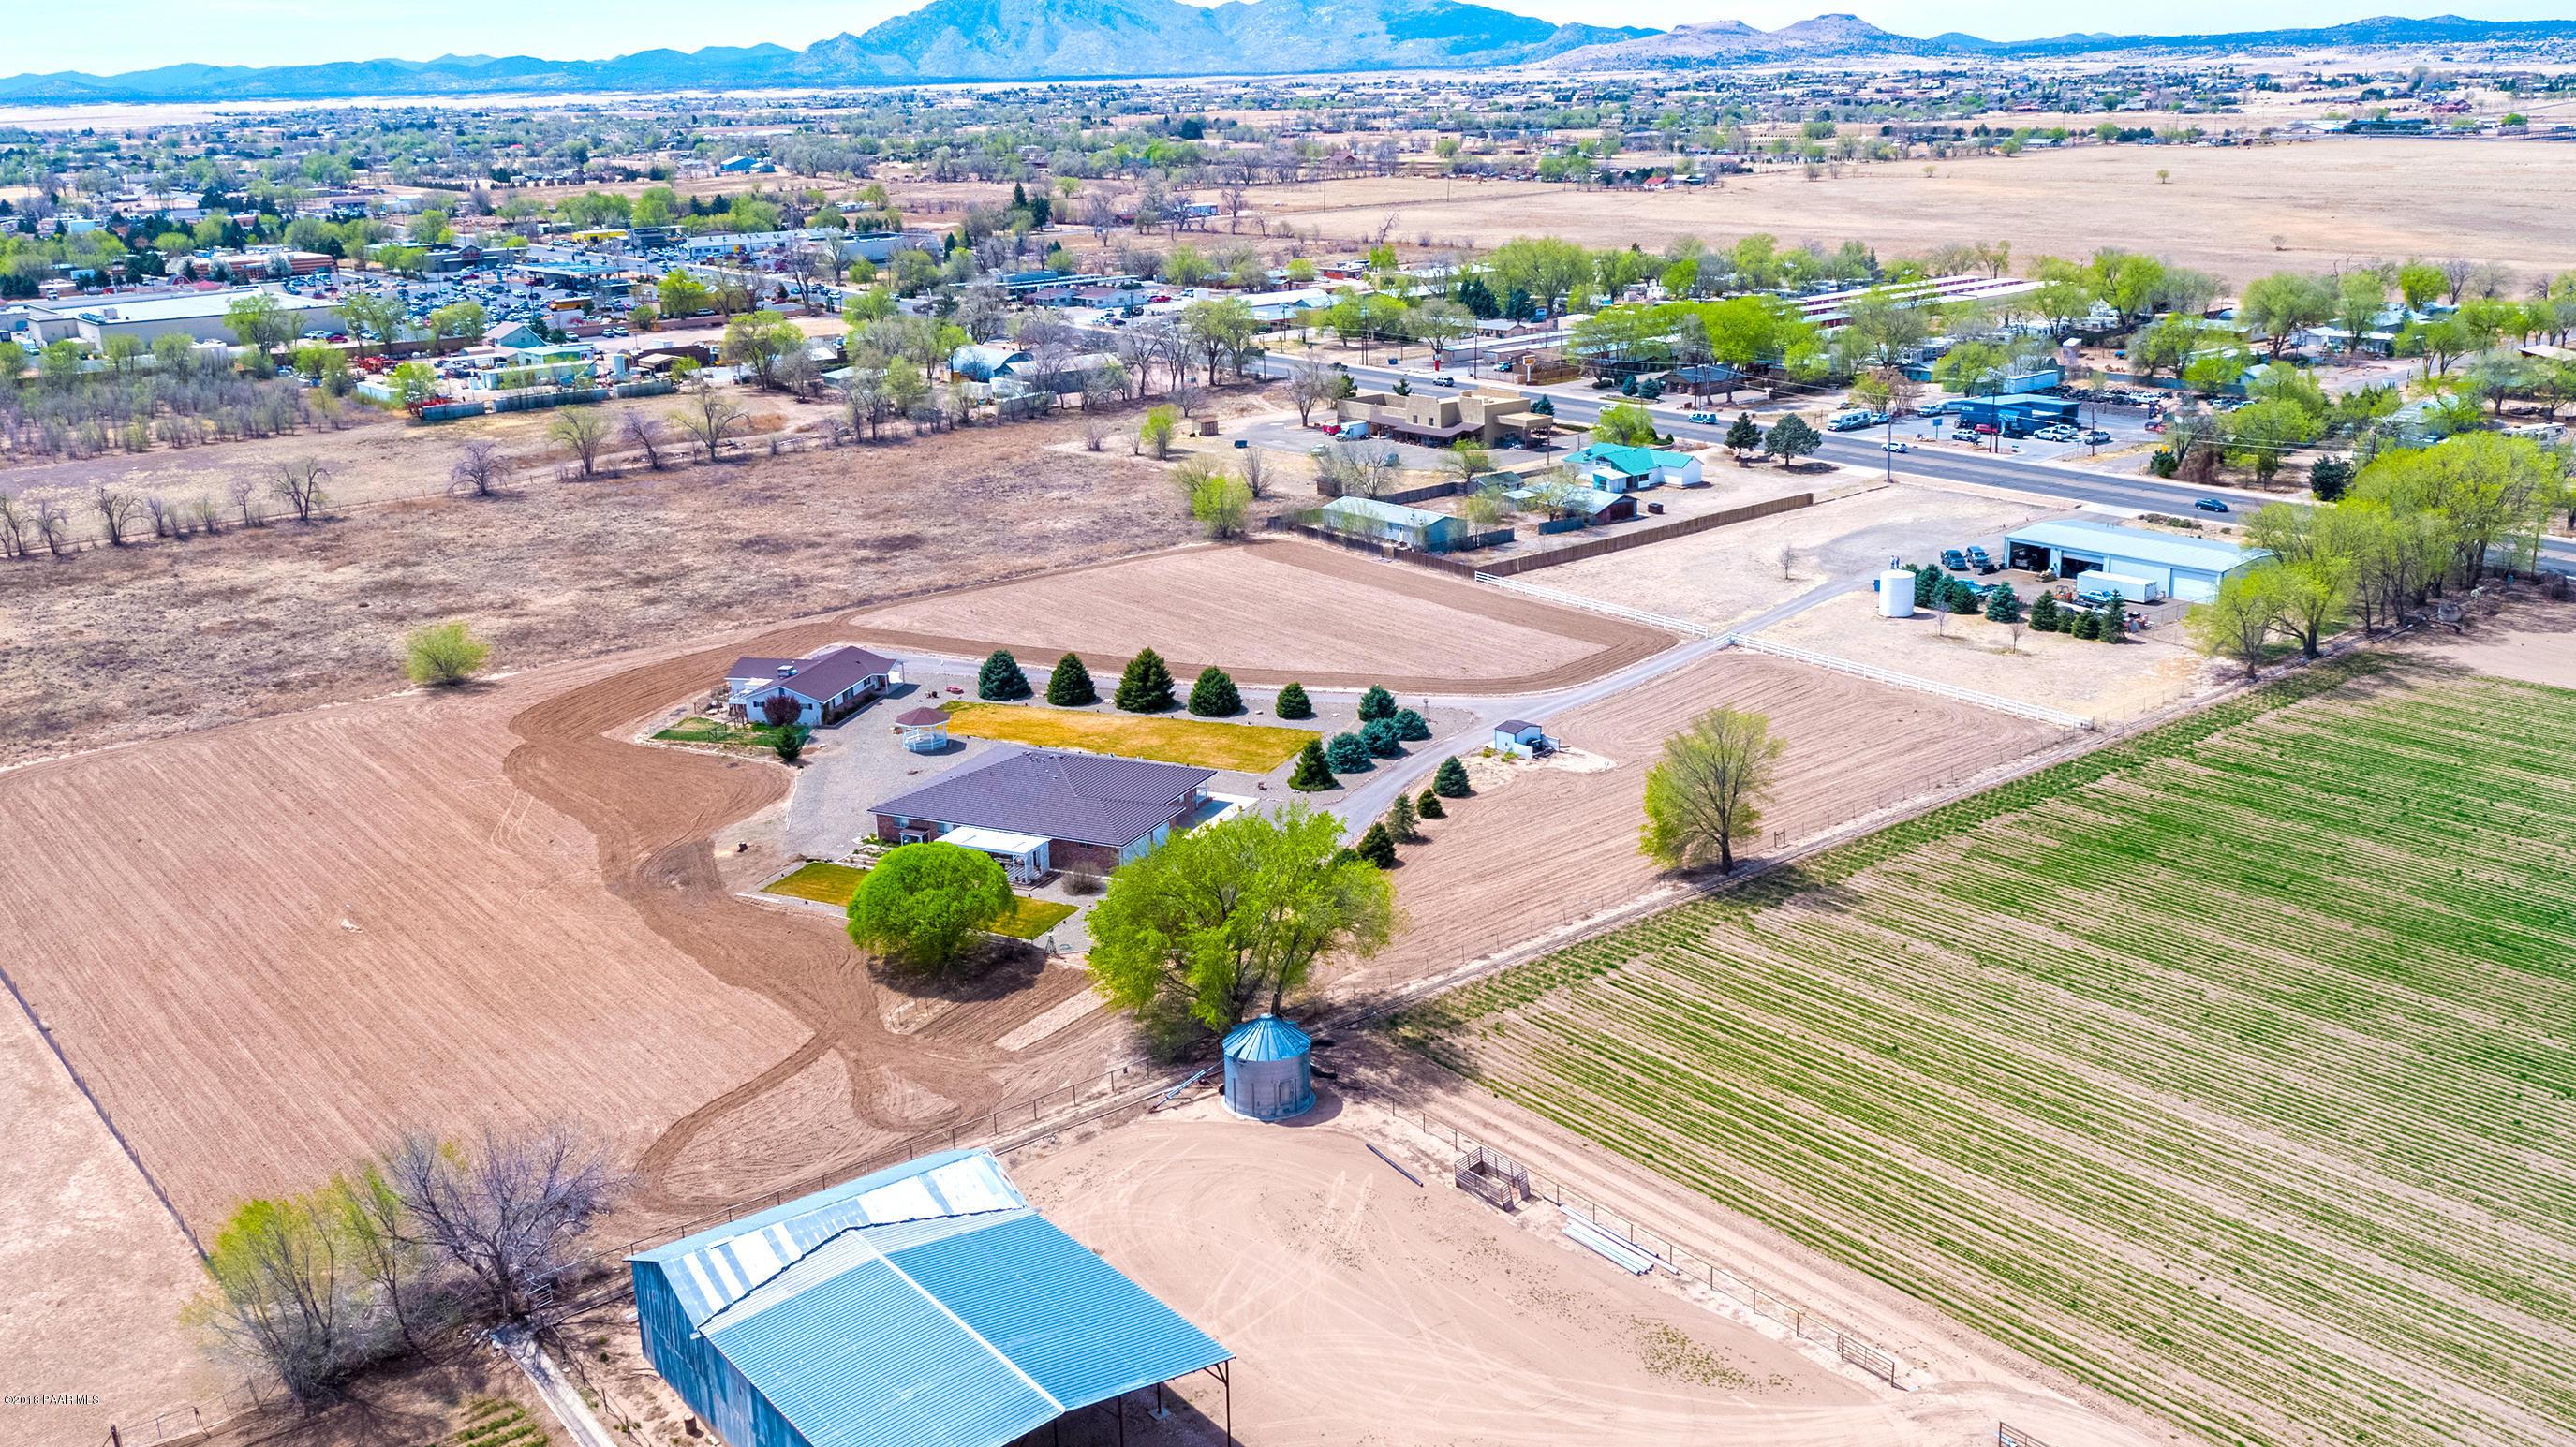 Photo of 1391 Hwy 89, Chino Valley, AZ 86323